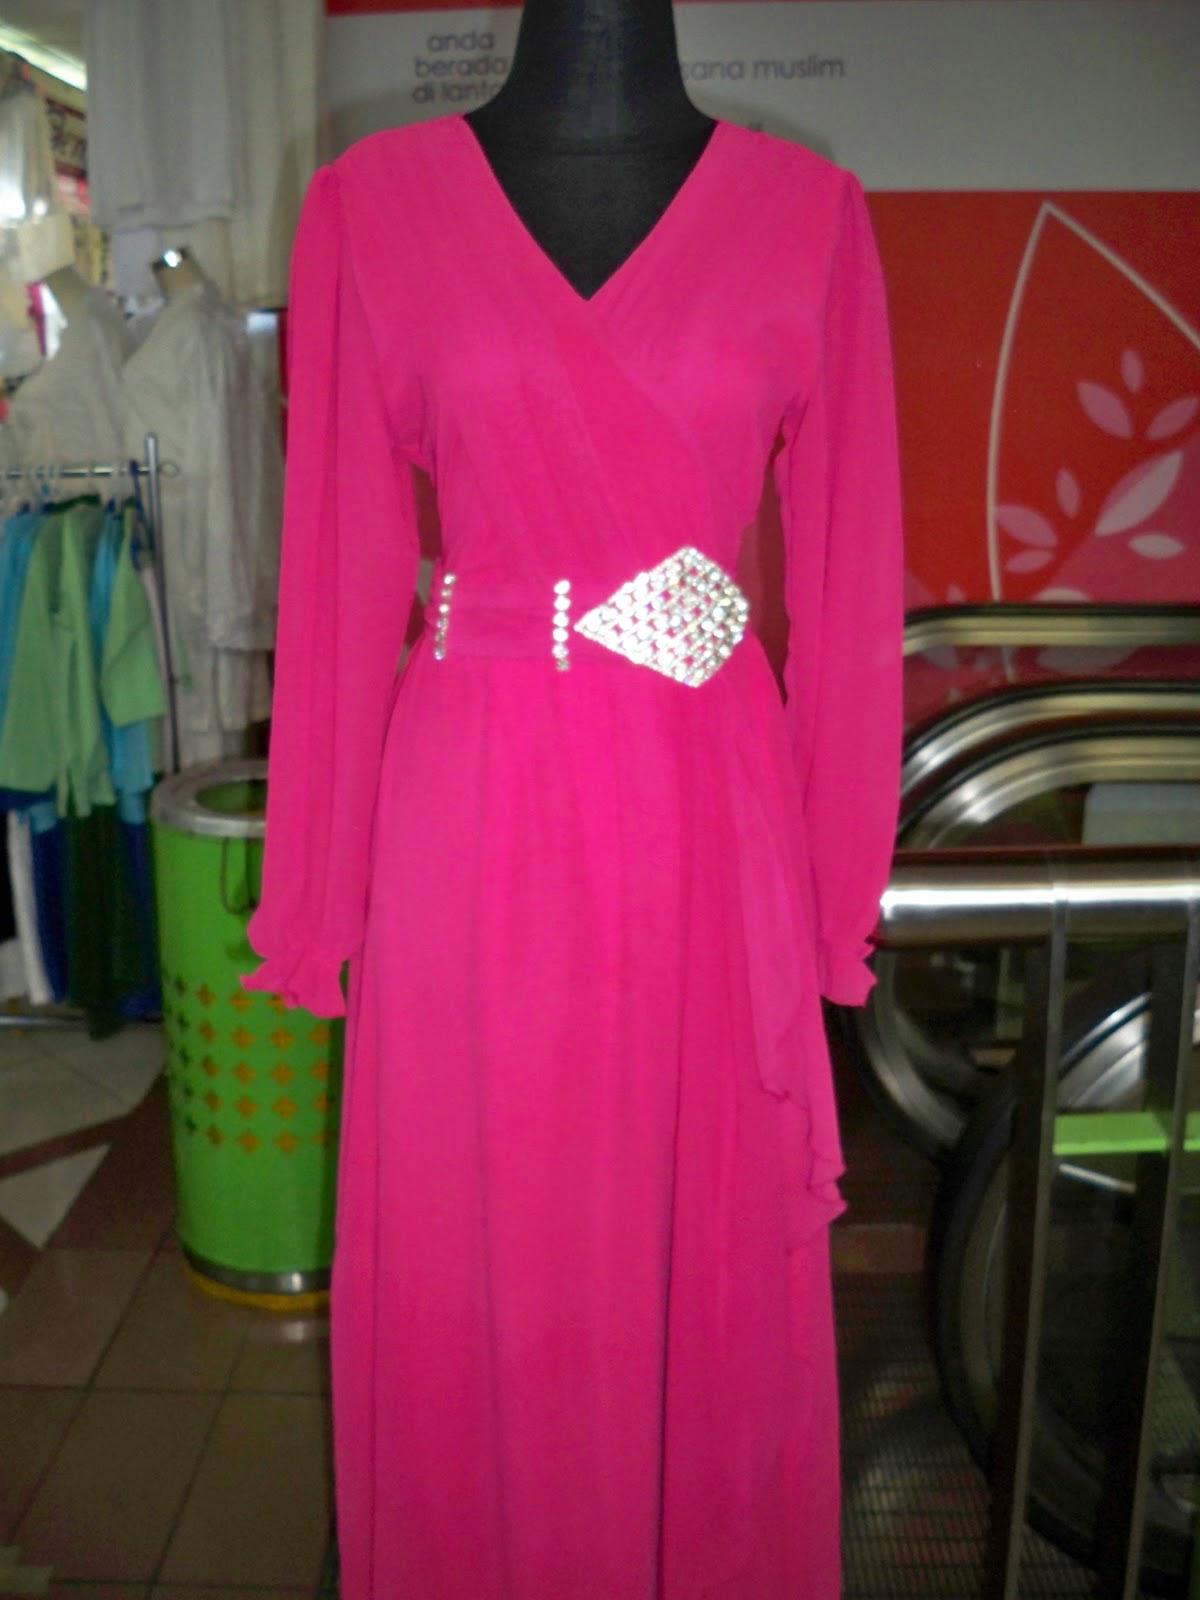 Koleksi Baju Toko Arserio Agustus 2012